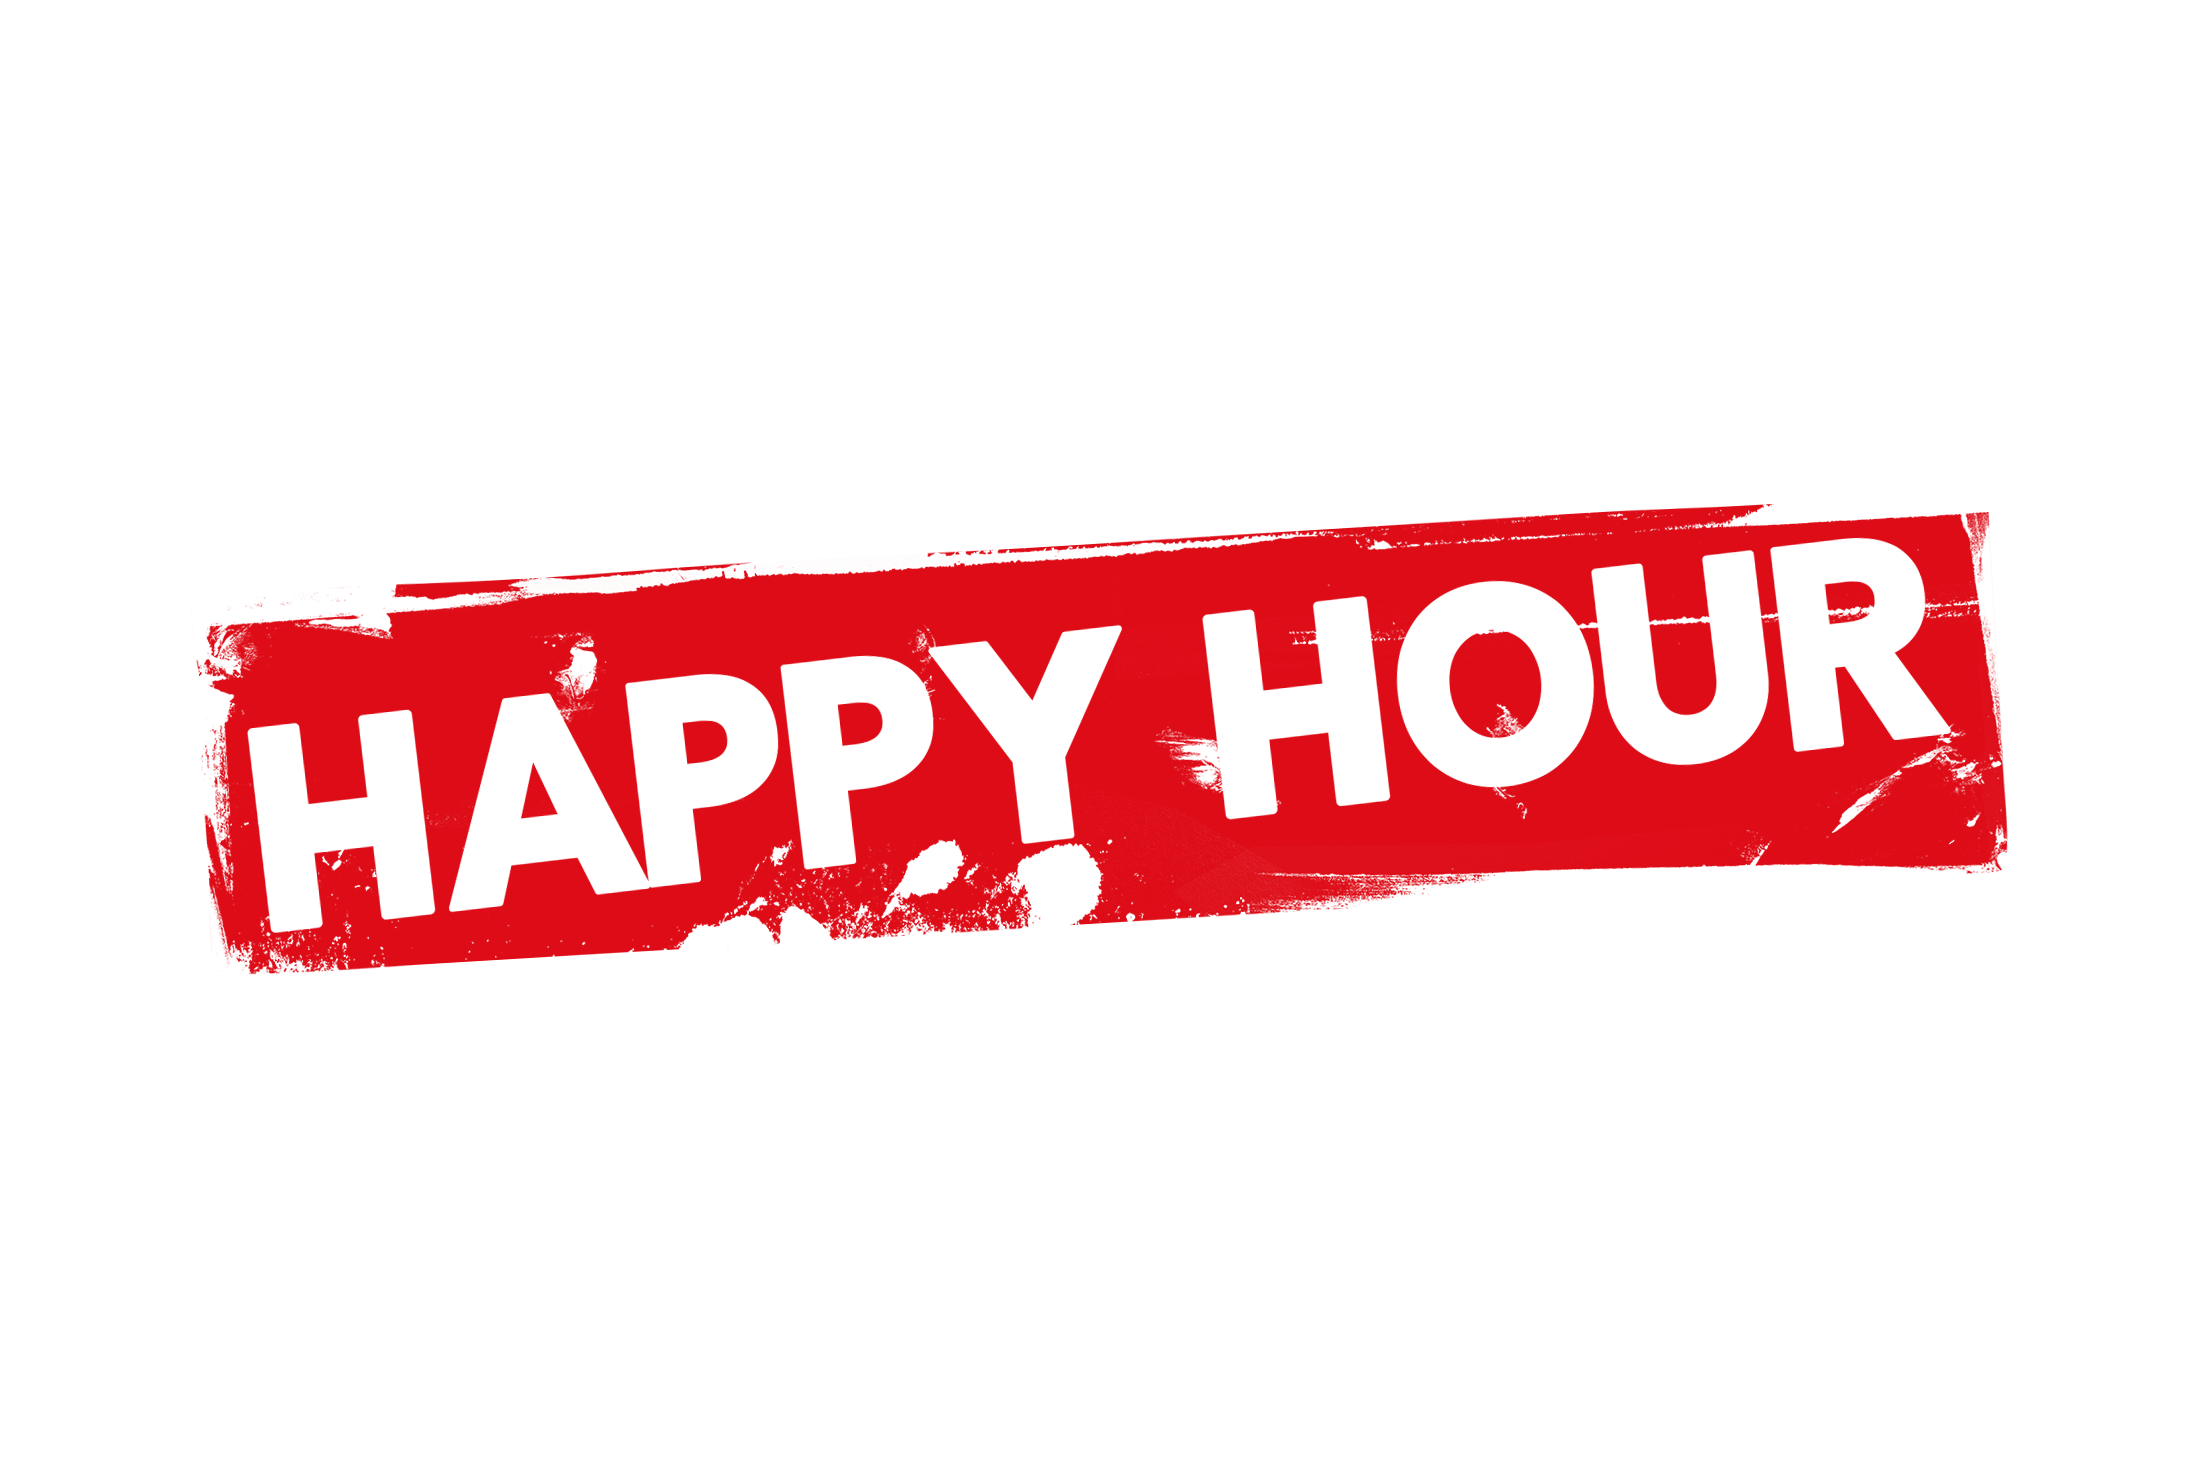 Grunge happy hour label PSD - PSDstamps